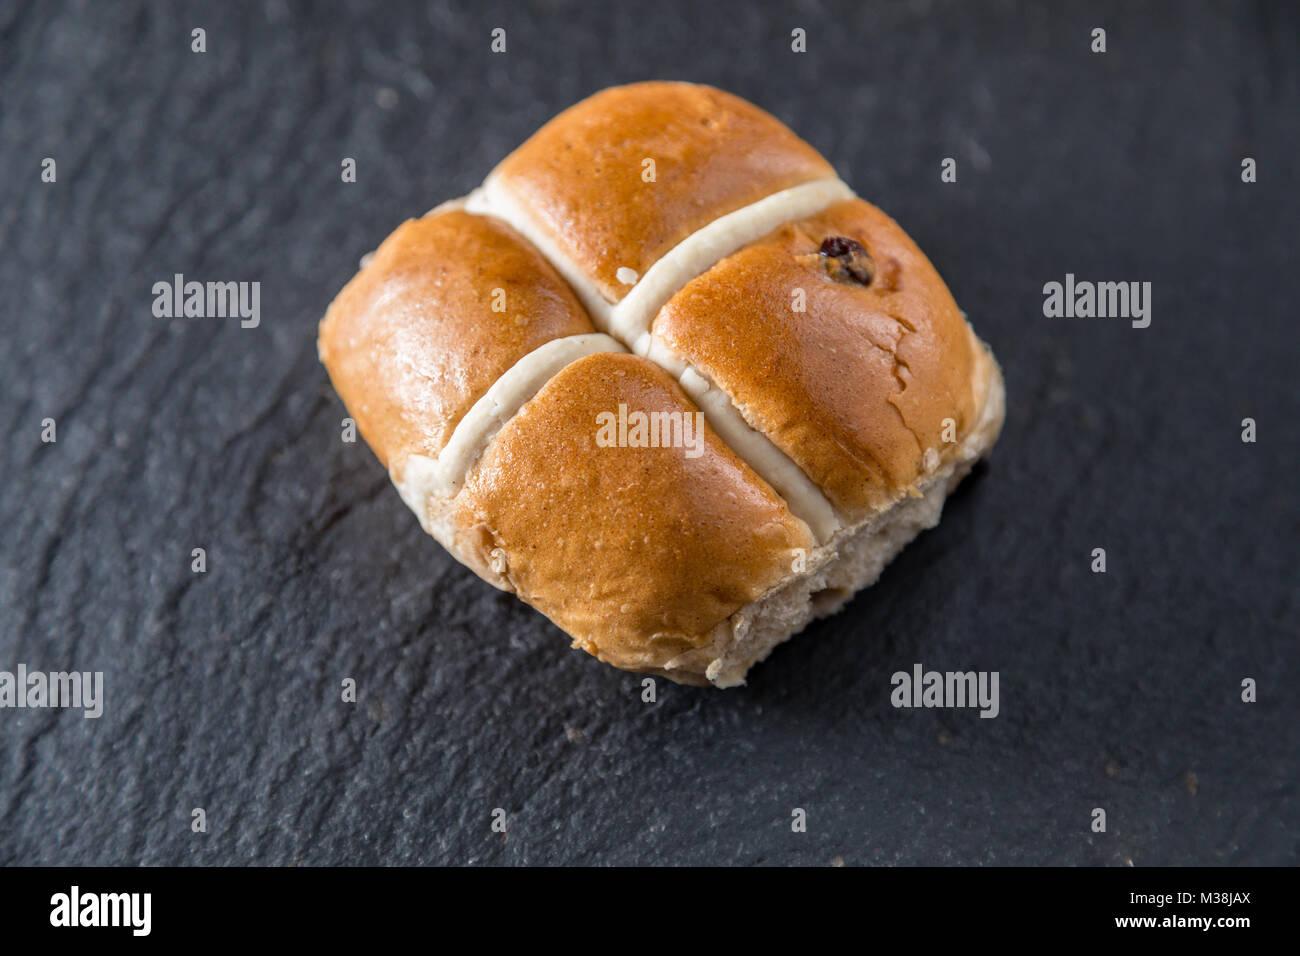 Hot cross bun n a grey slate platter - Stock Image